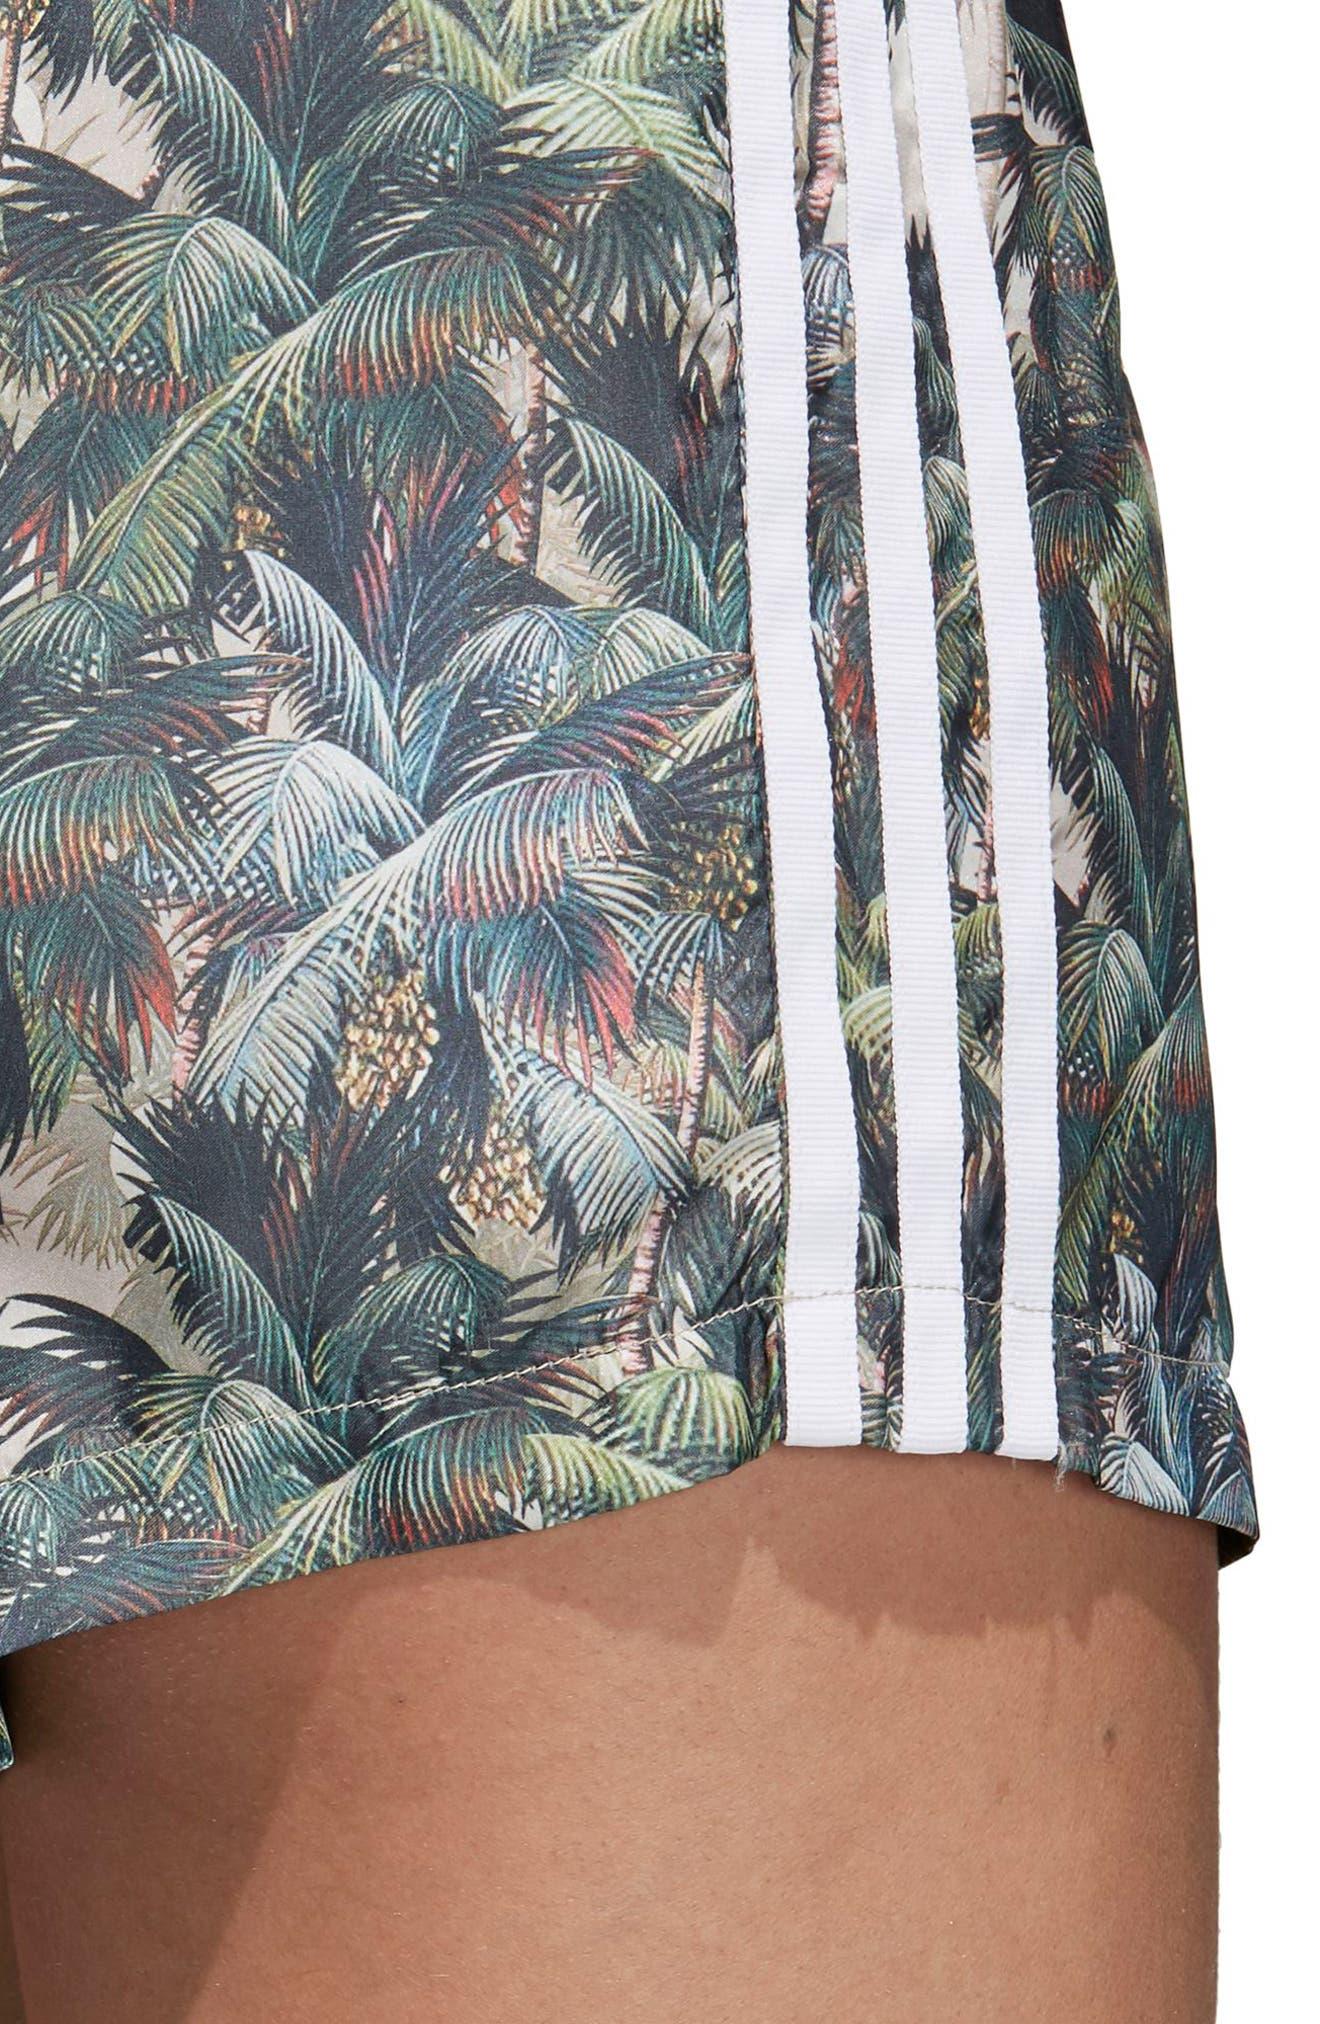 Originals High Waist Shorts,                             Alternate thumbnail 4, color,                             Multicolor